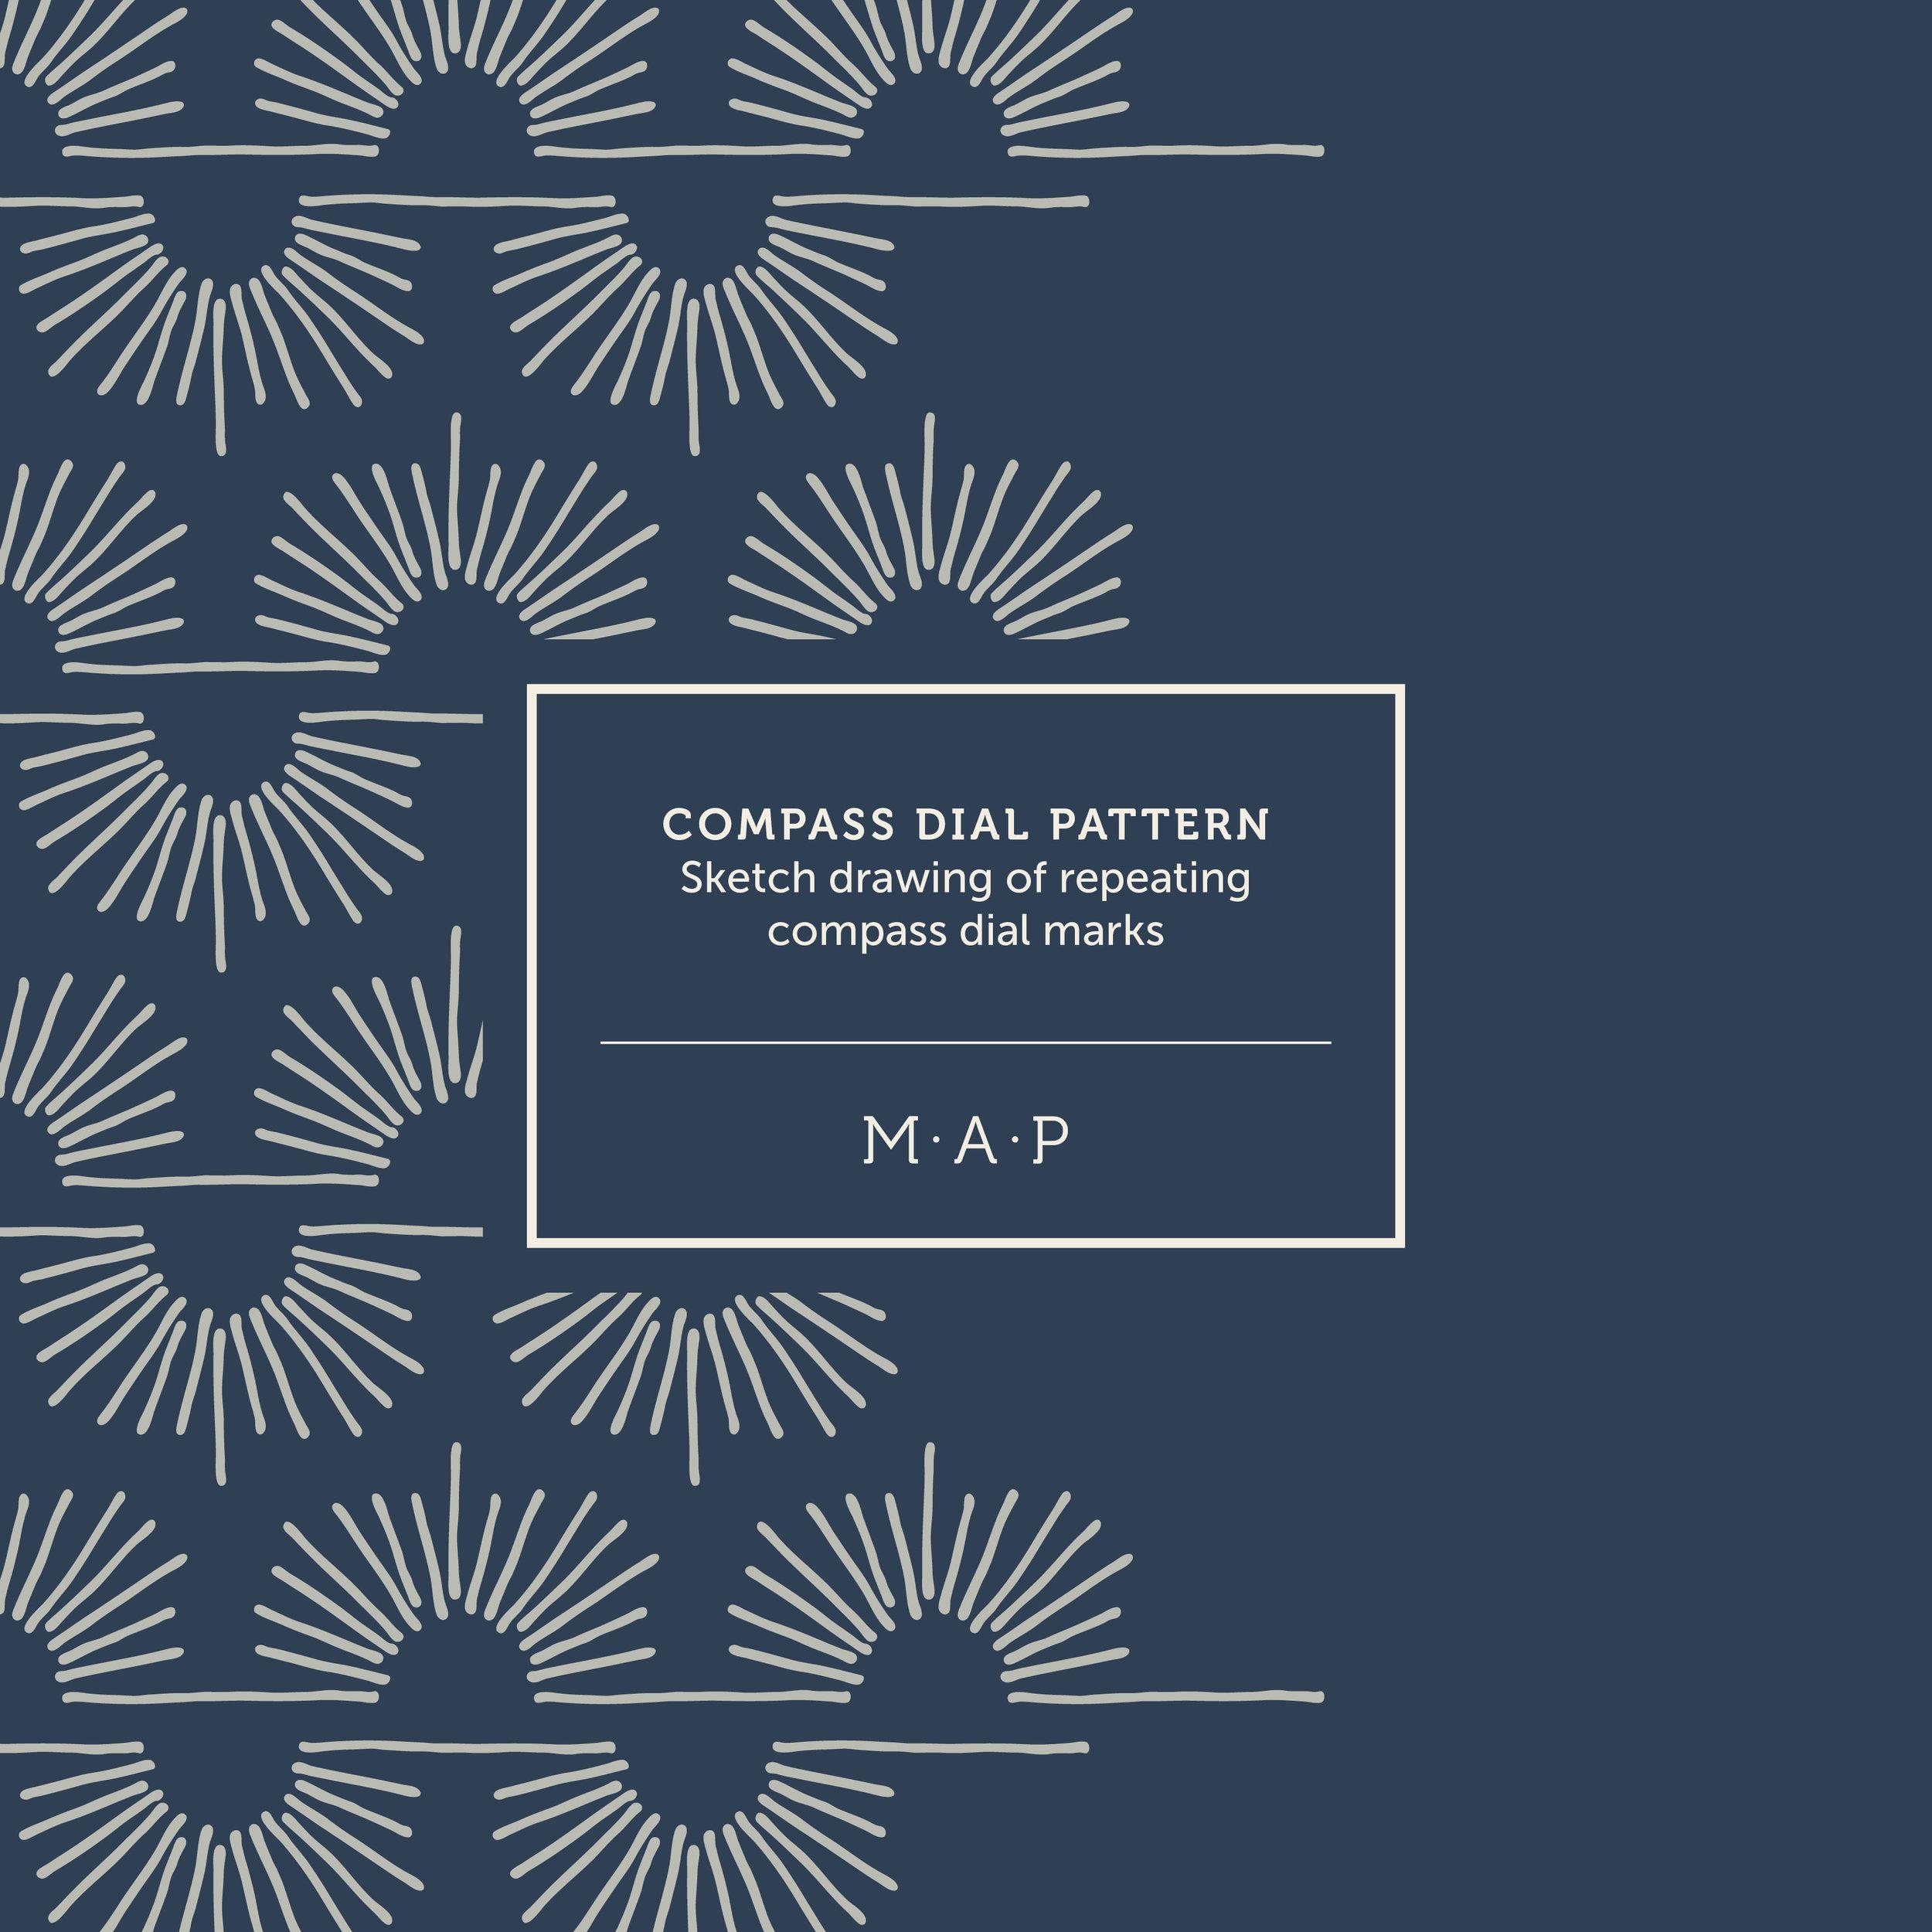 brand explanation_MAP12.jpg